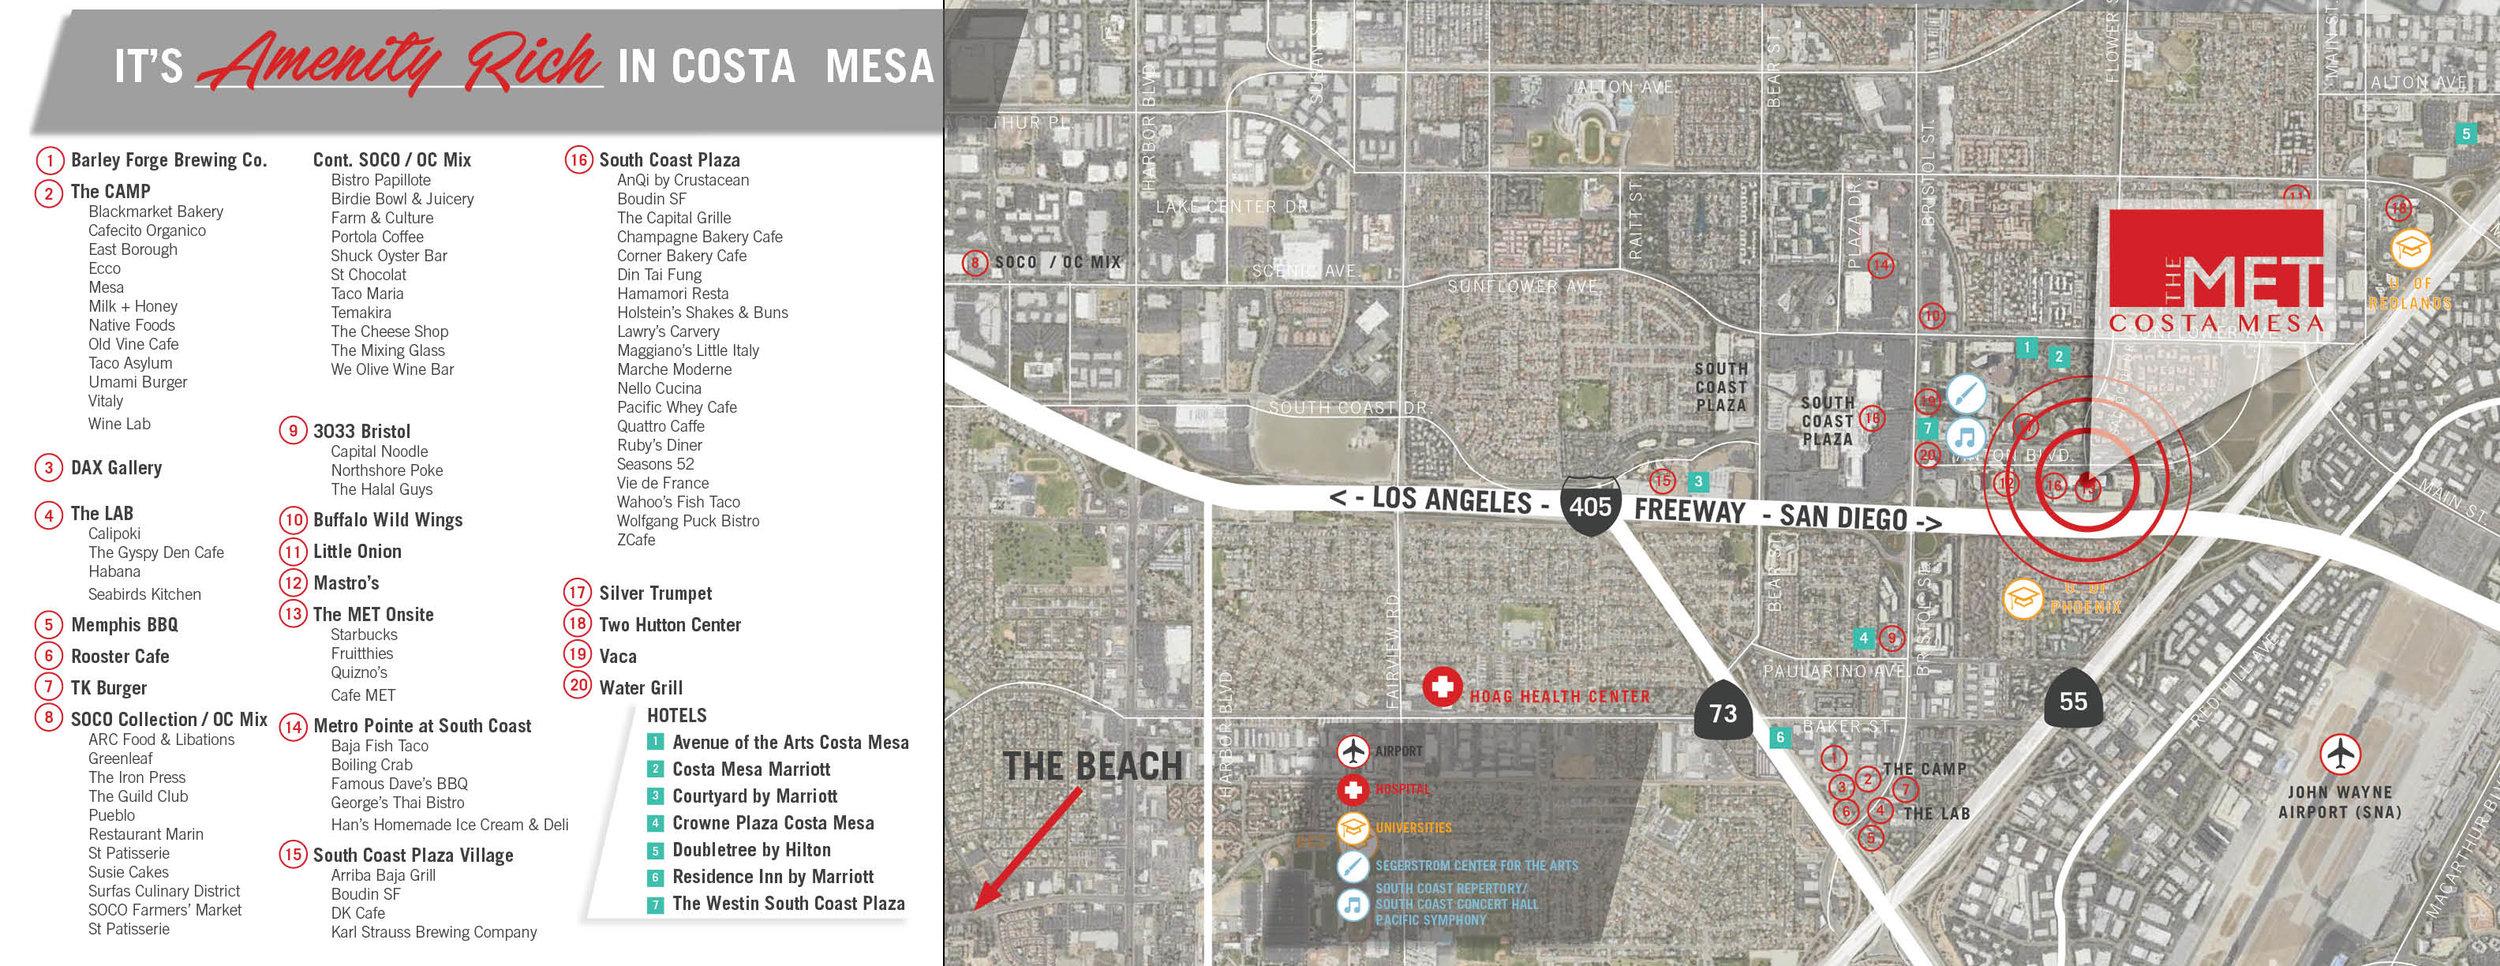 The-MET-Costa-Mesa-12.jpg